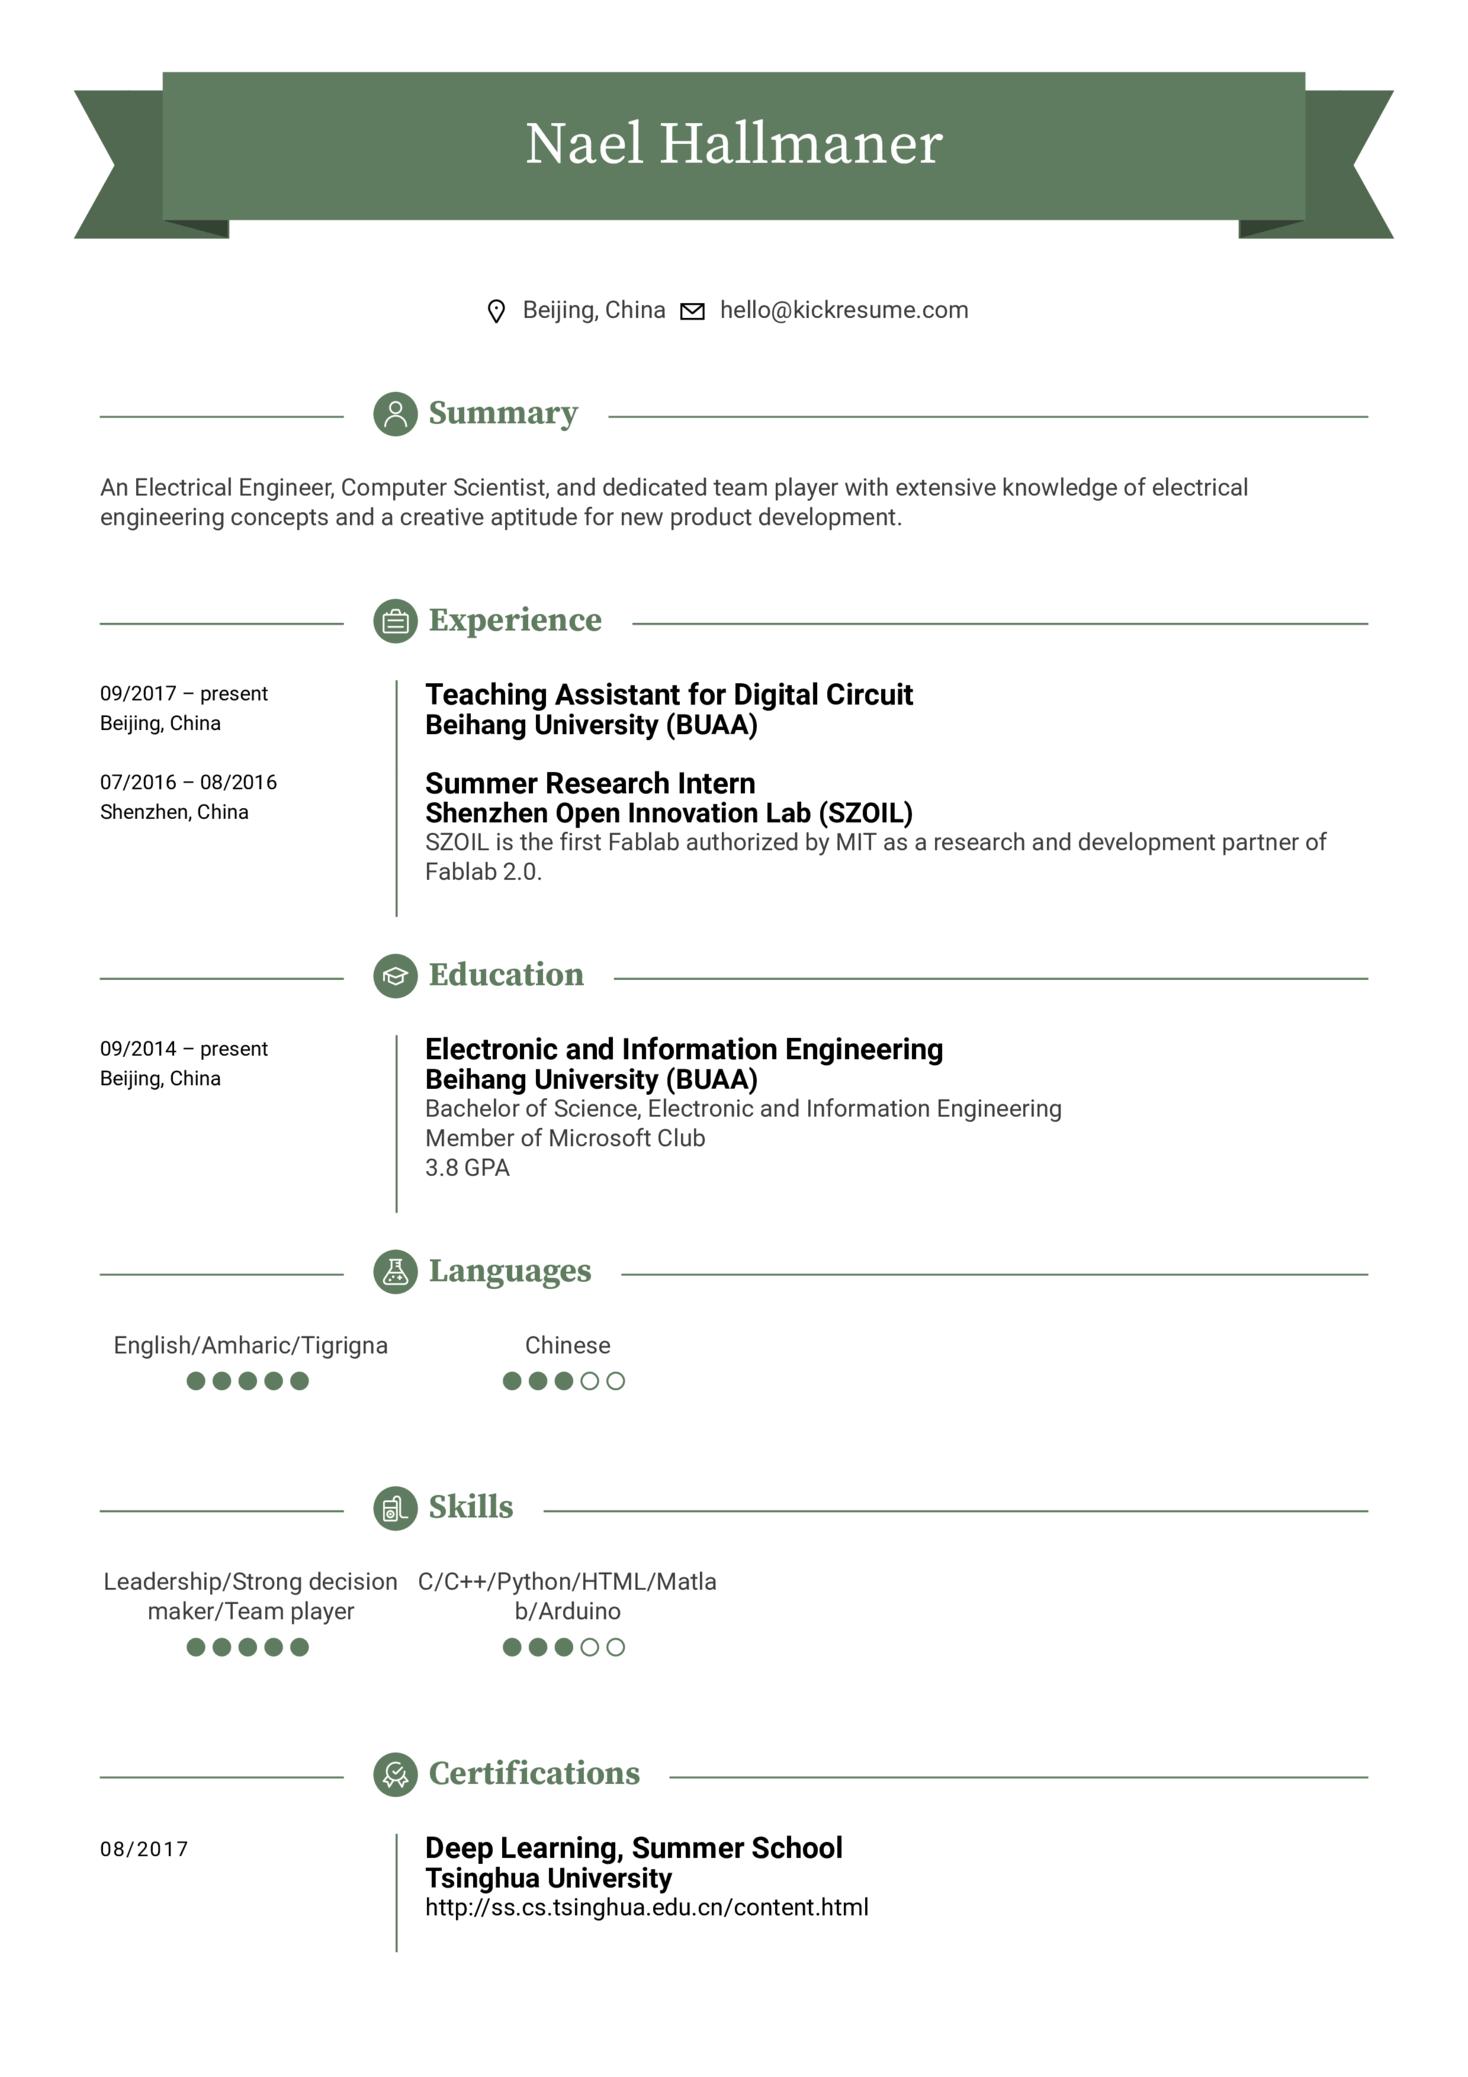 Teaching Assistant Resume Sample (parte 1)